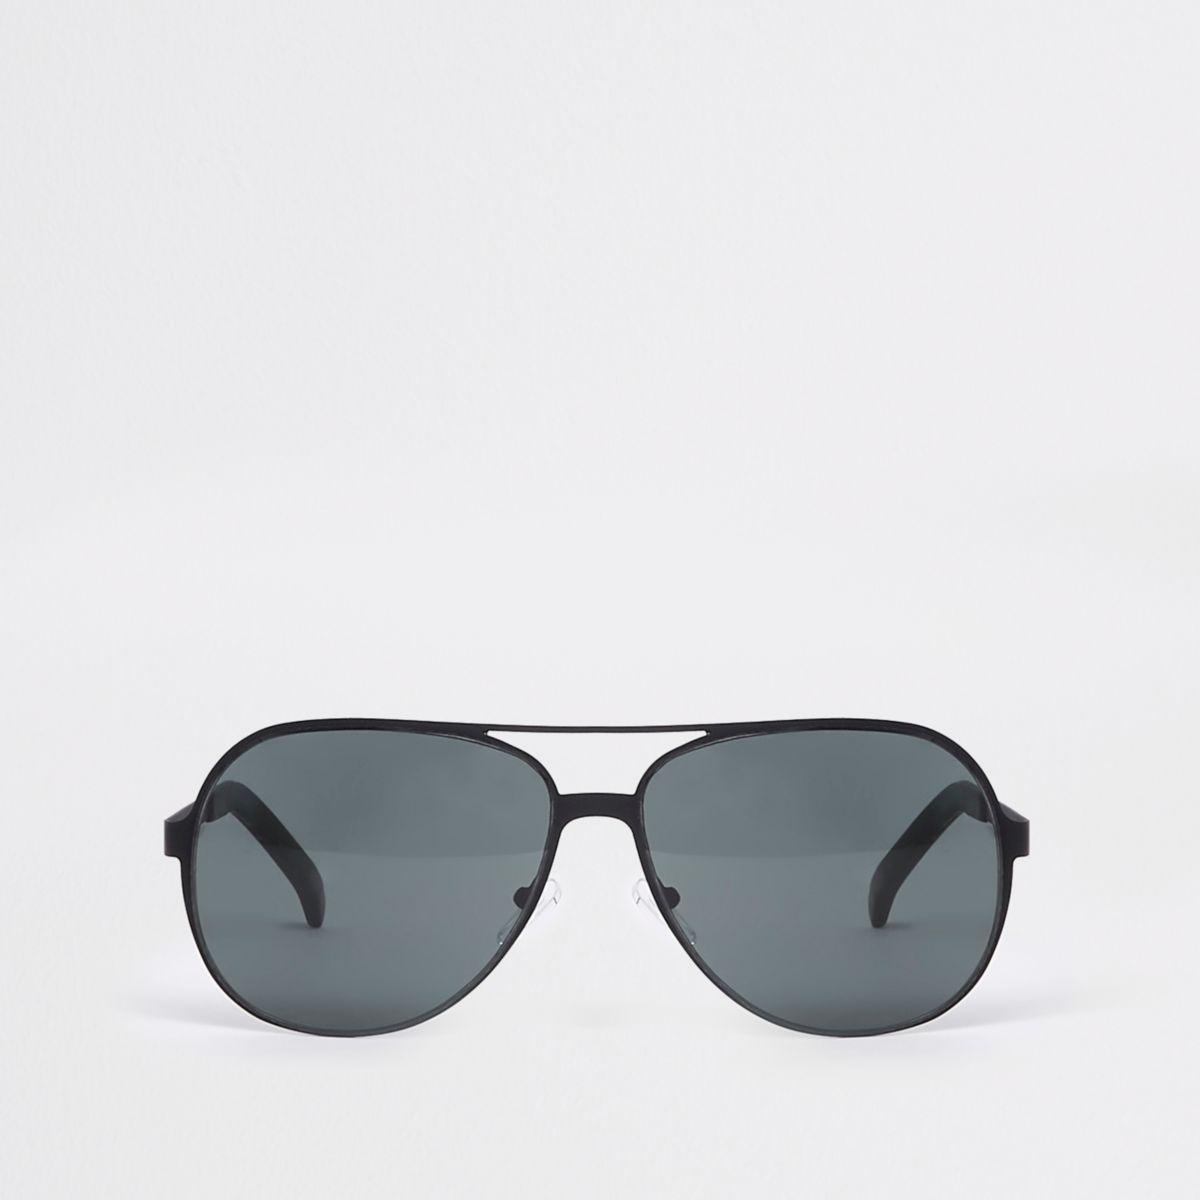 Black metal aviator sunglasses